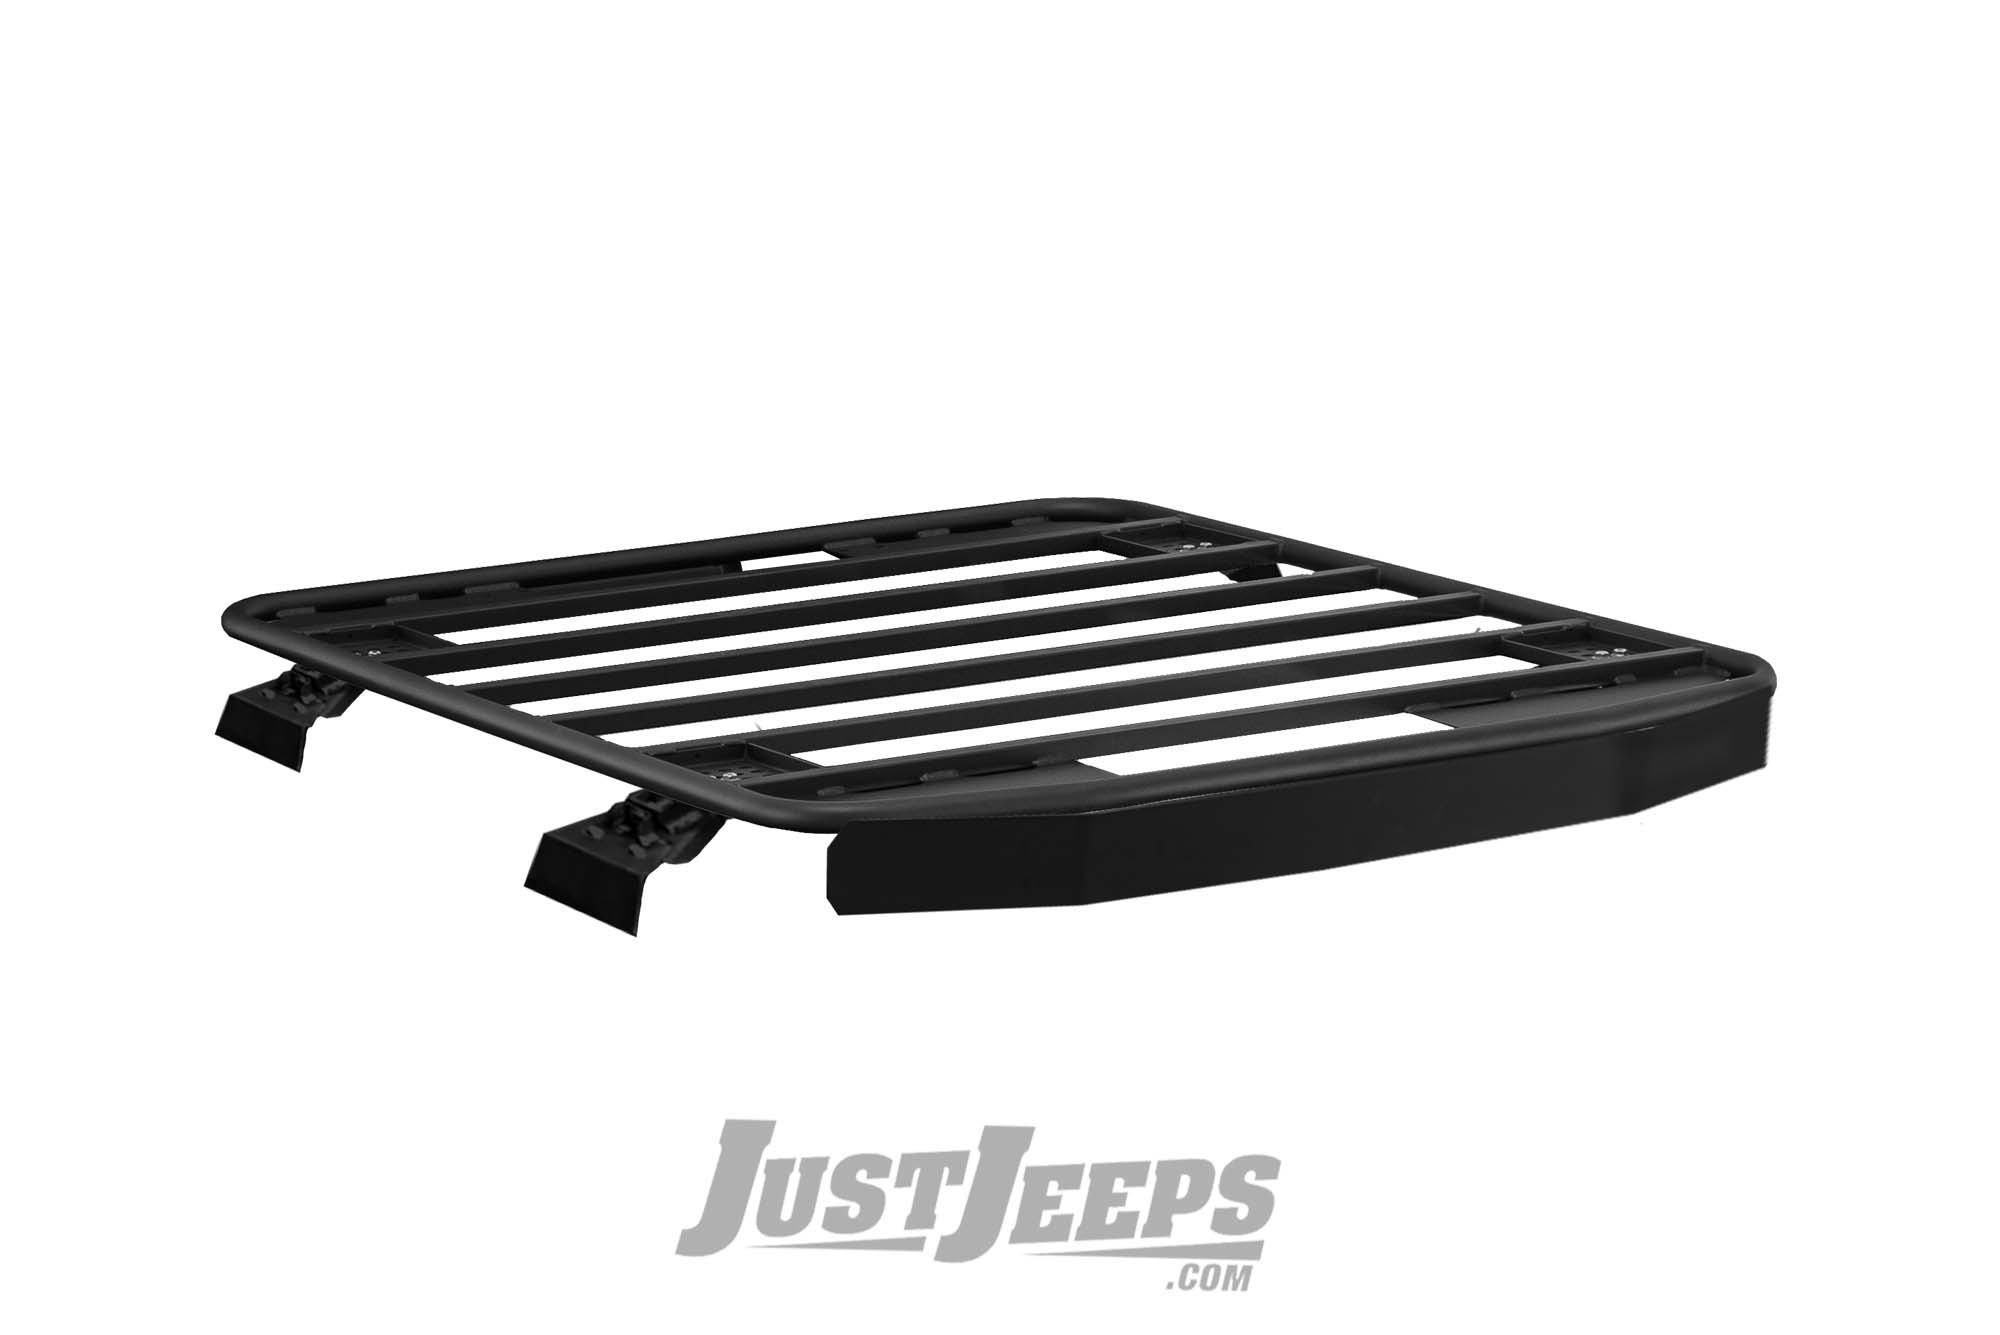 Warrior Products Platform Roof Rack with Rain Gutter Mounts For 2018+ Jeep Wrangler JL Unlimited 4 Door Models